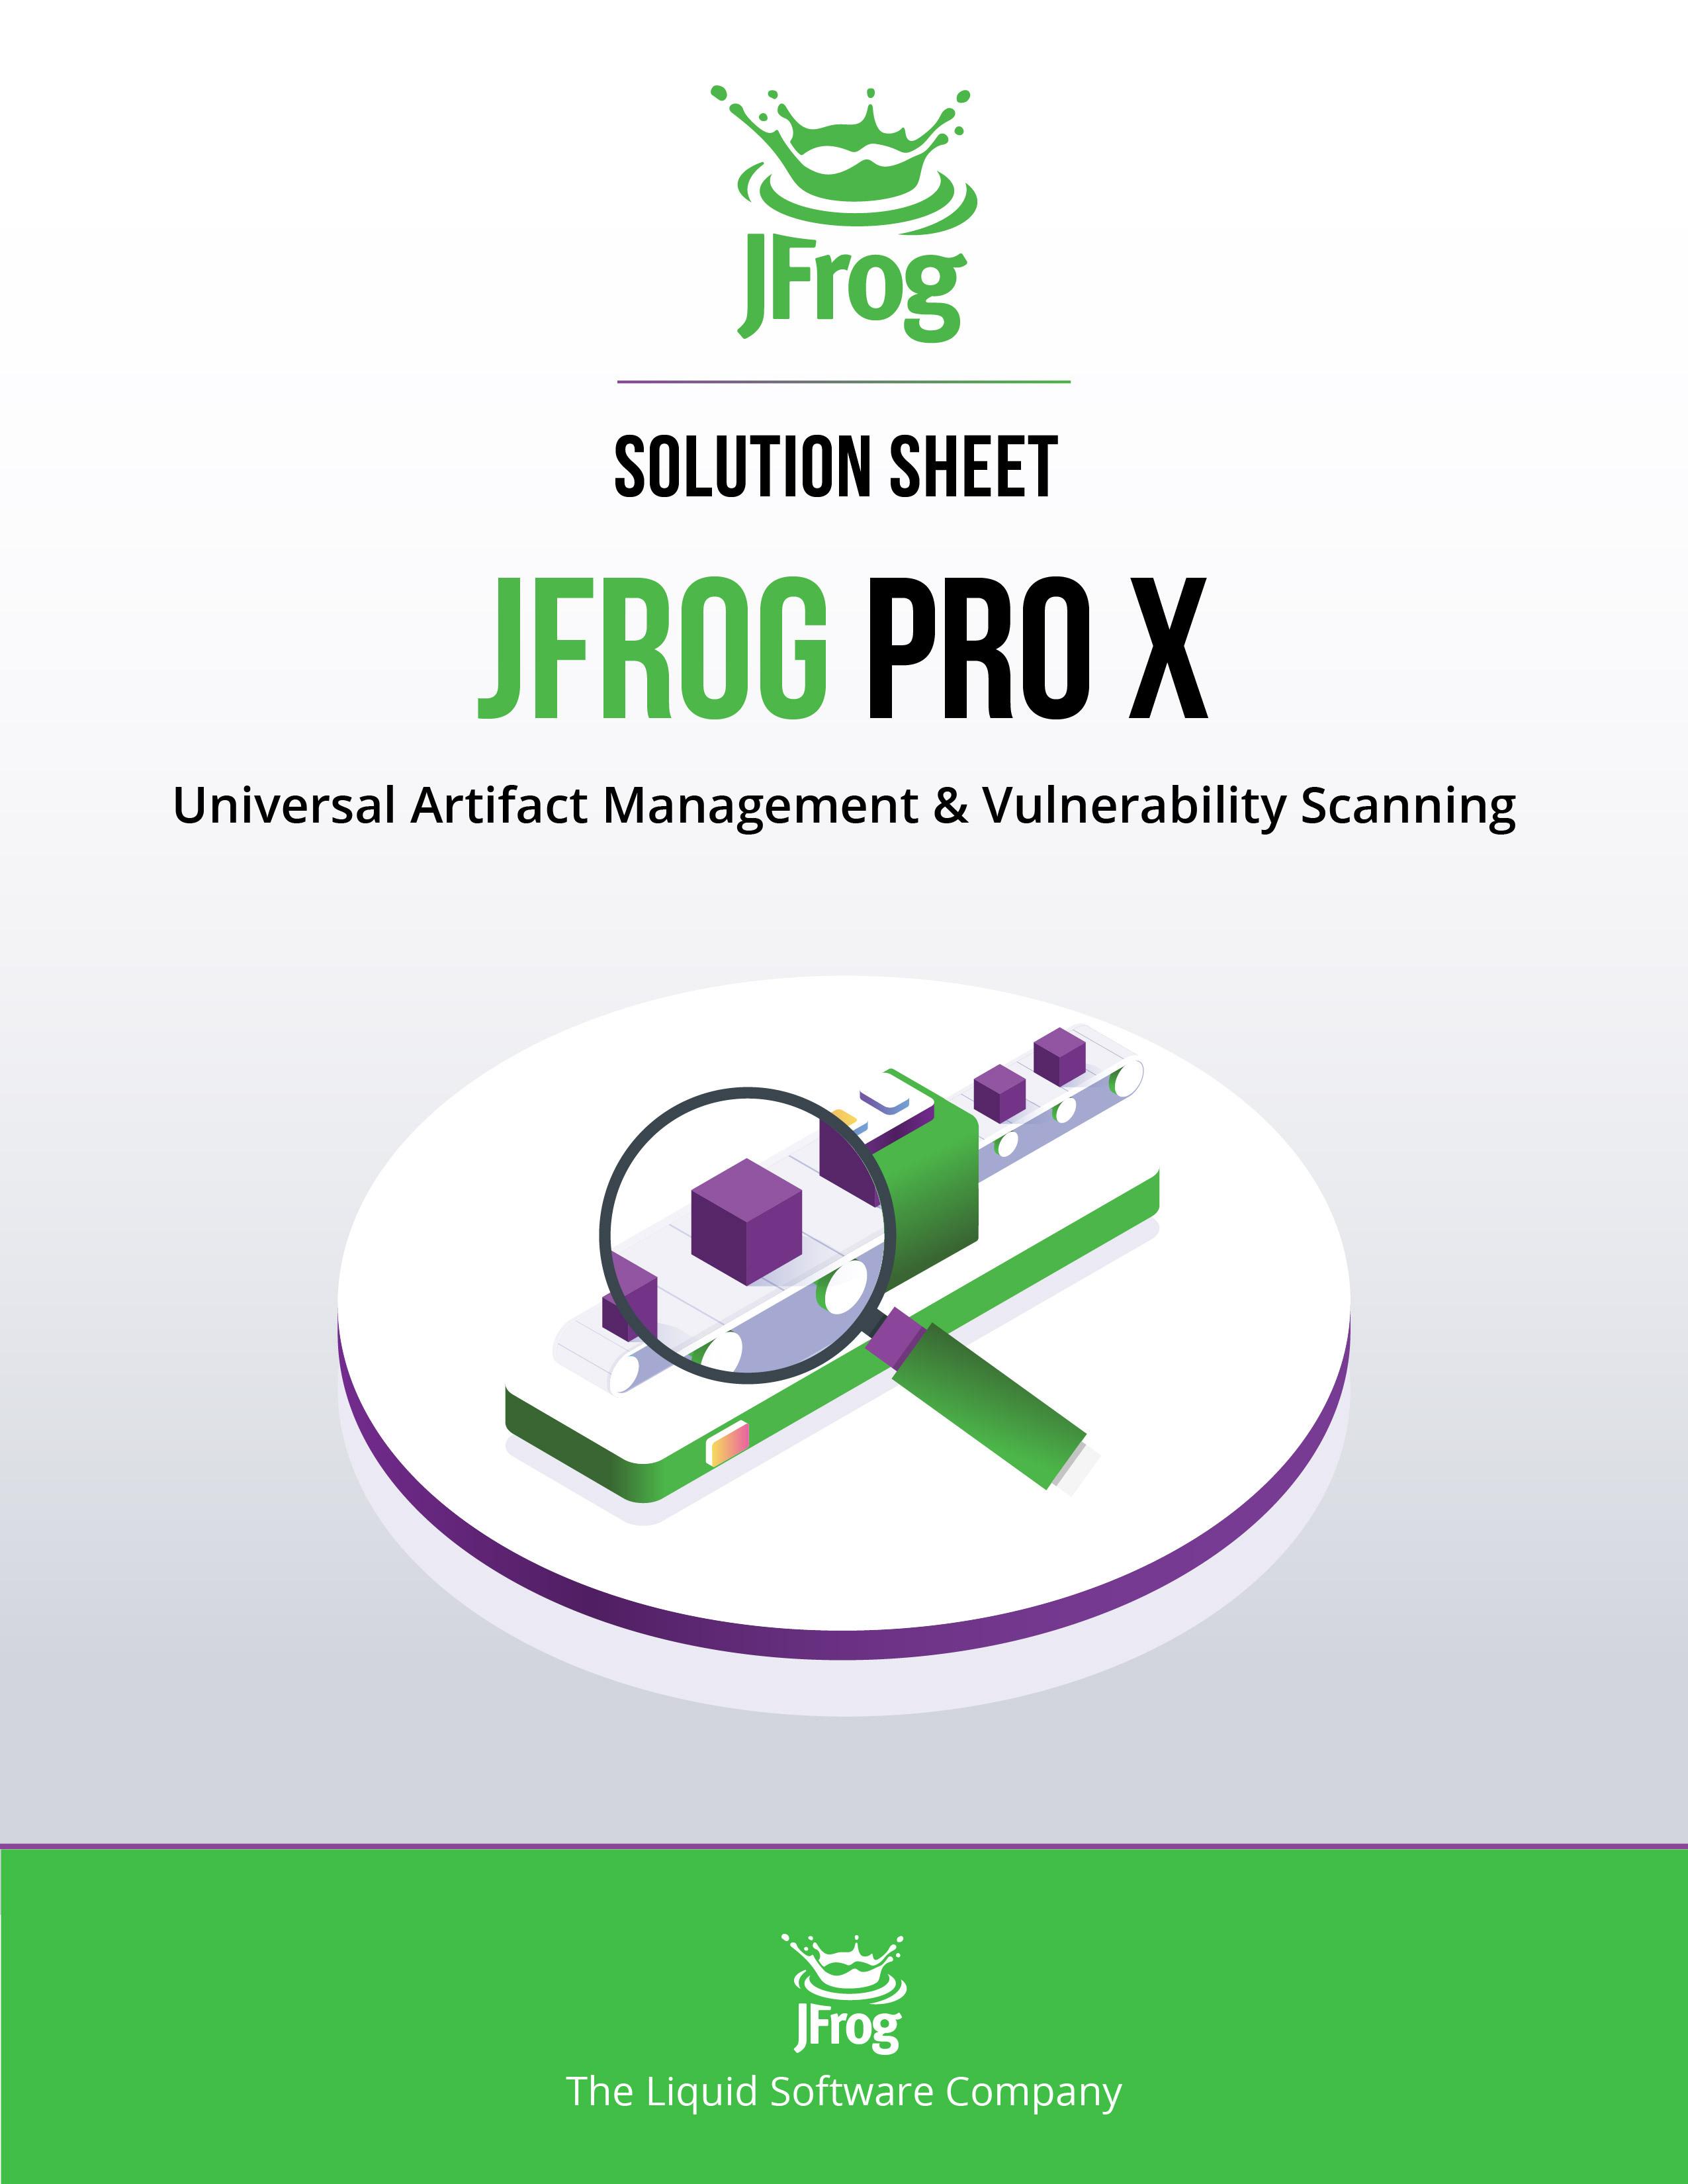 JFrog Pro X Solution Sheet